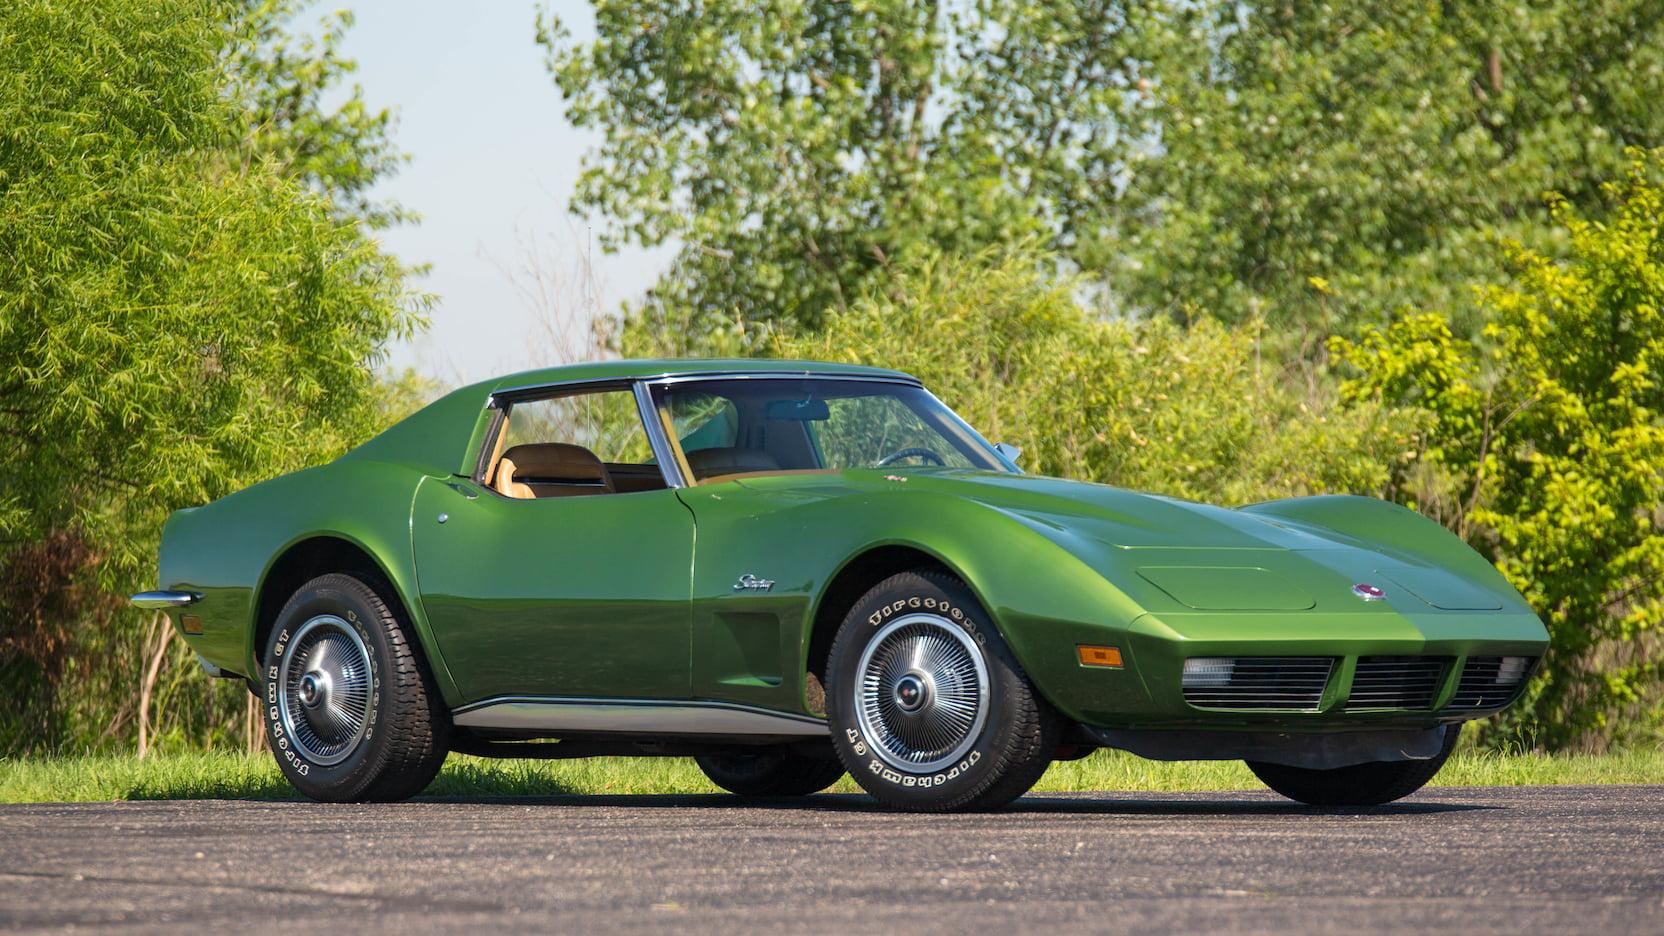 1973 Corvette Coupe green front 3/4